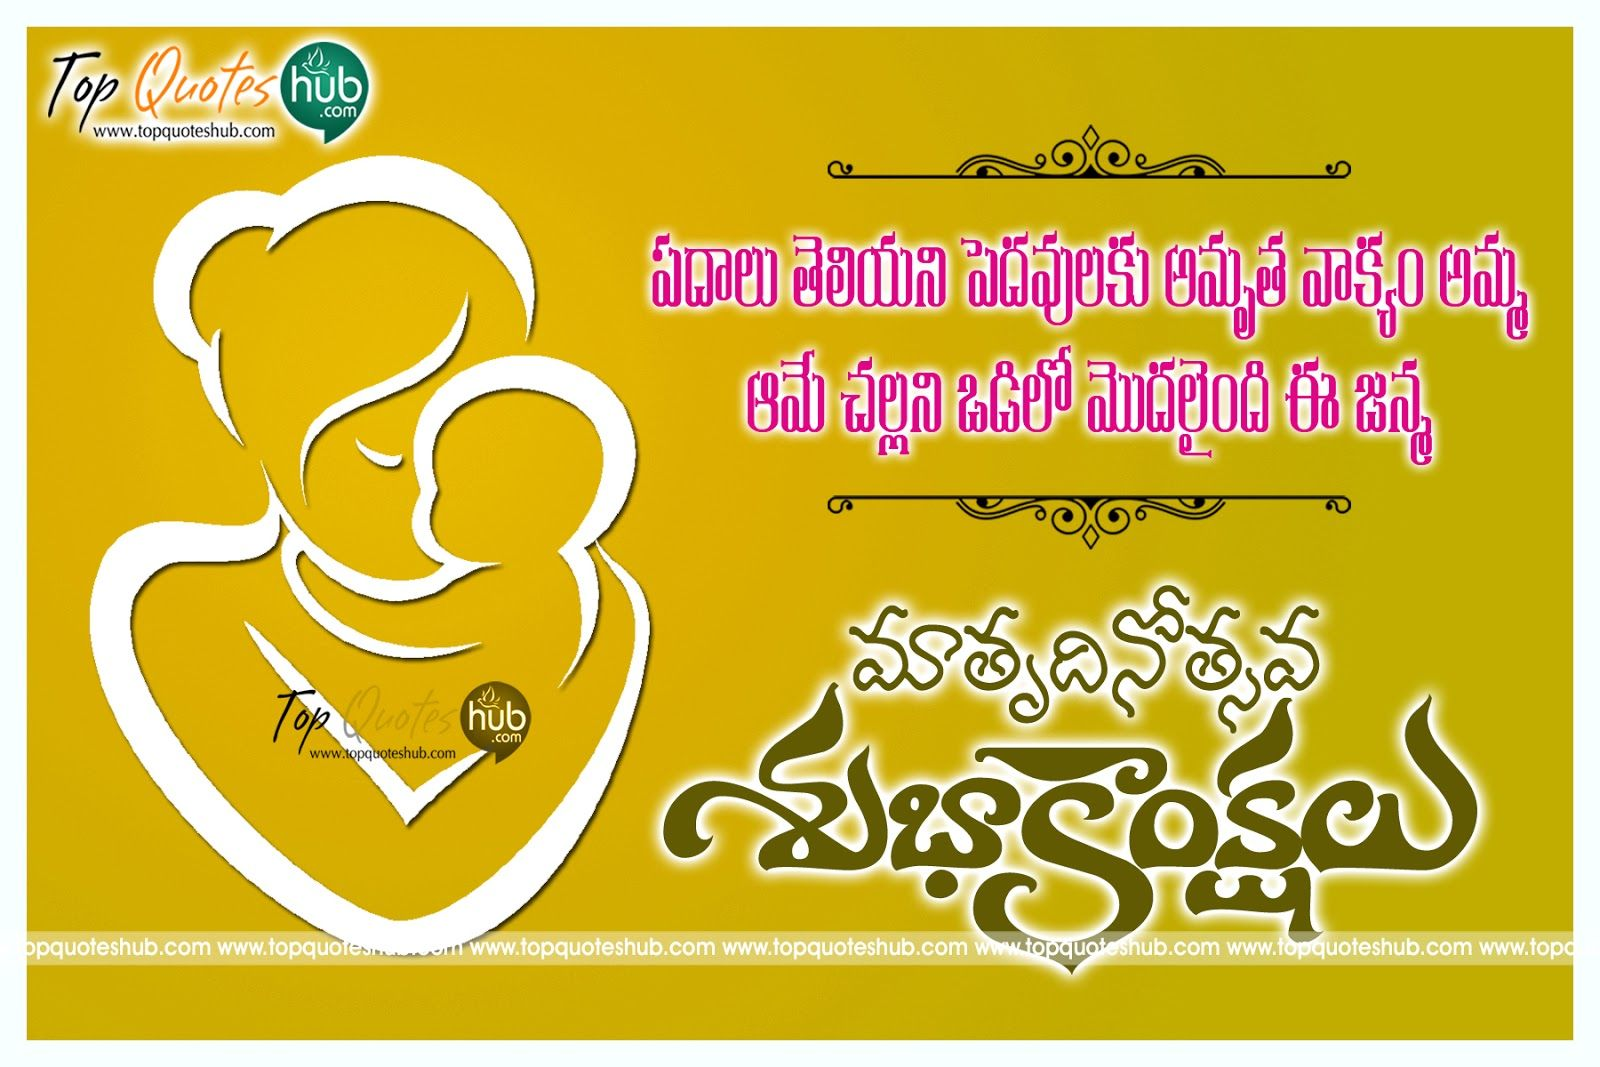 Teluguquotez In Telugu Quotes Tamil Quotes Bengali Quotes Hindi Quotes Mothers Day Quotes Mother S Day Special Quotes Friends Quotes